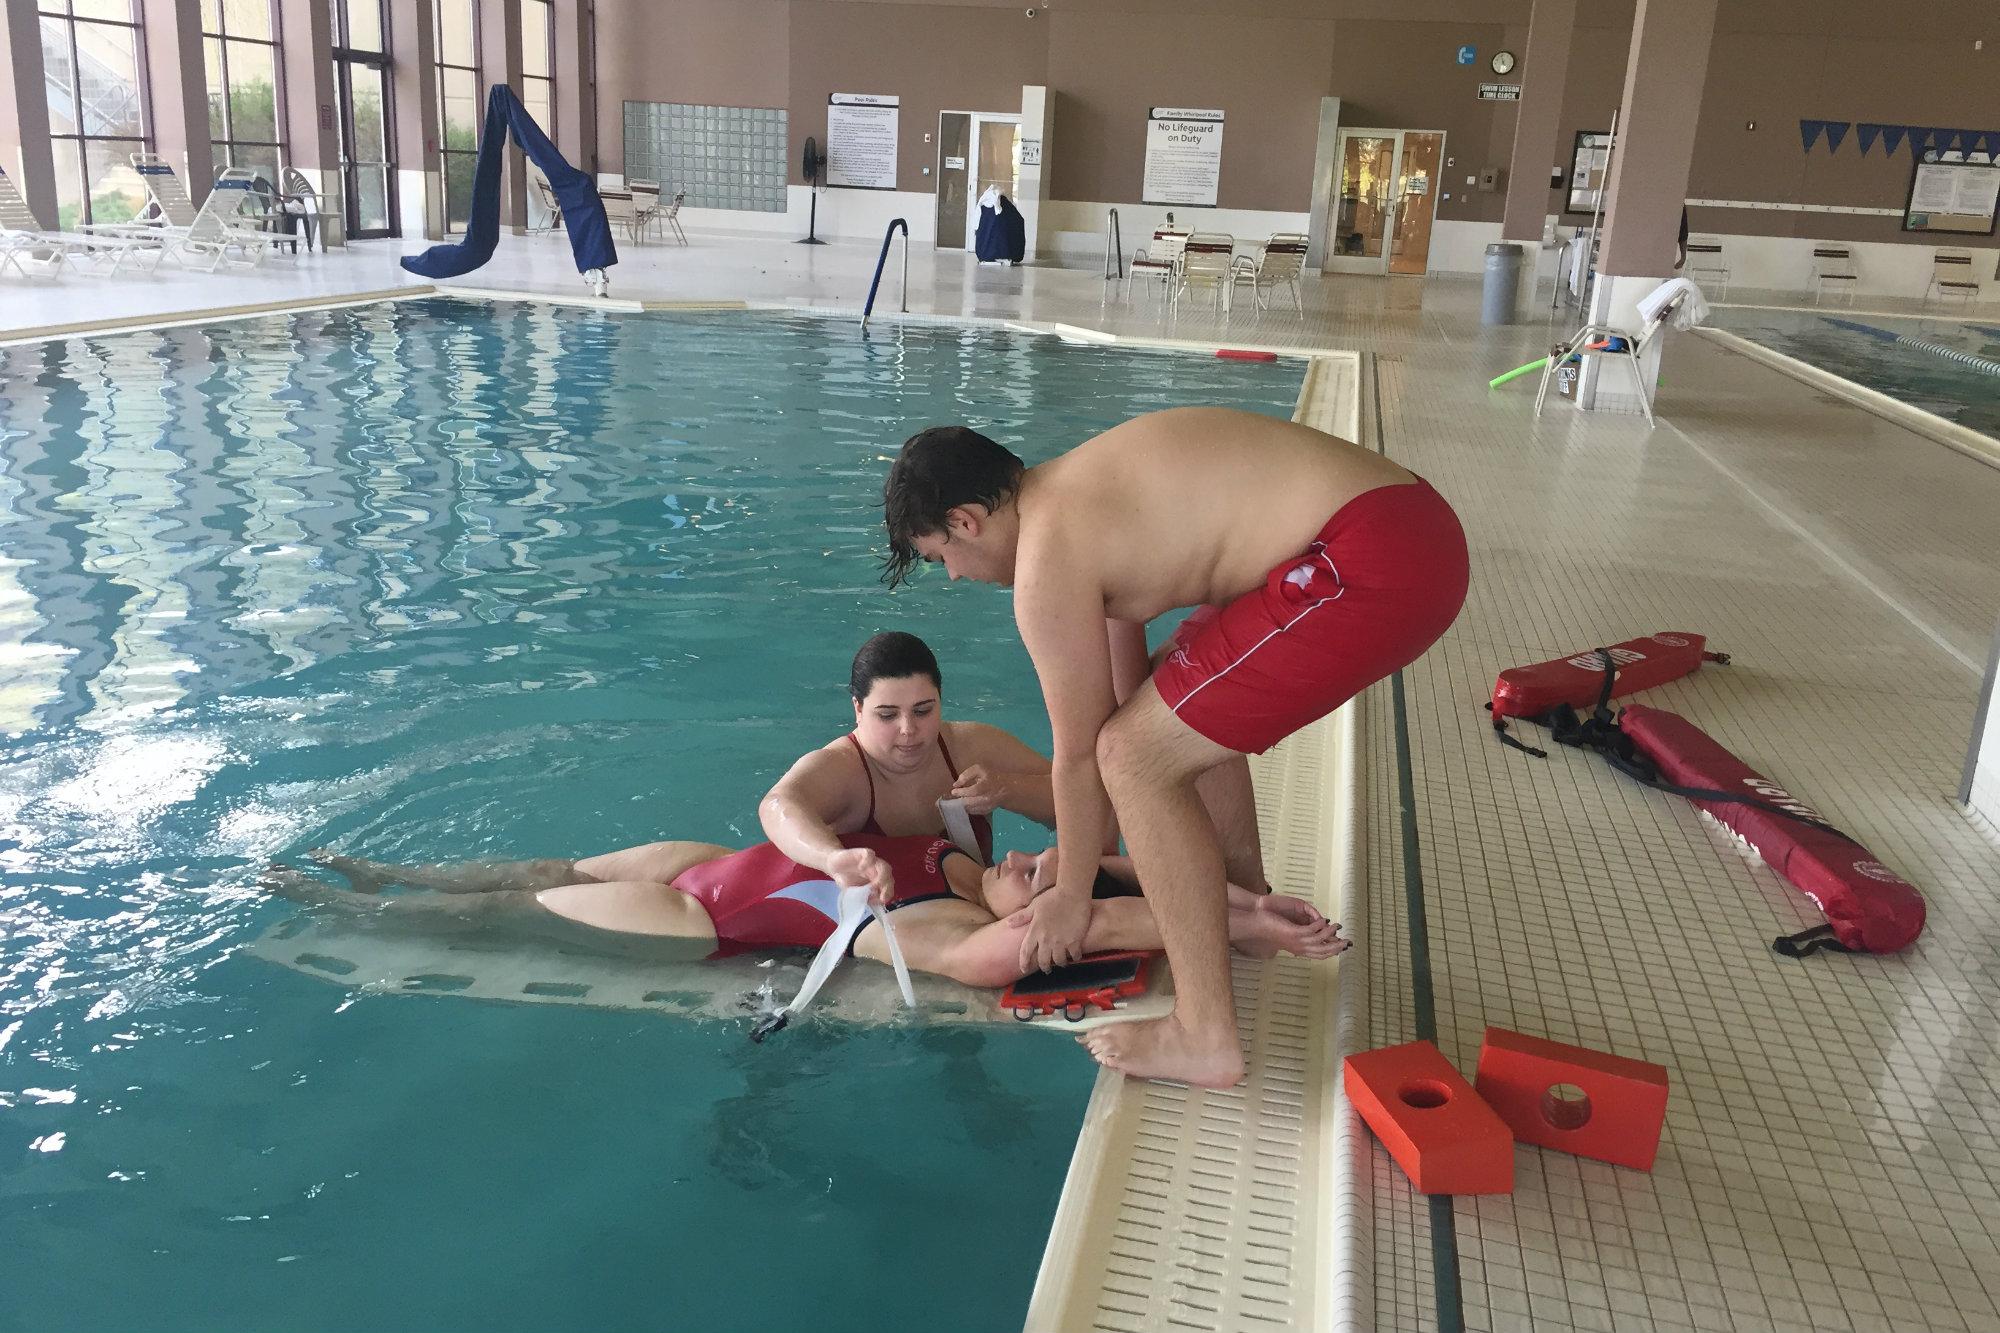 2018 Best of Aquatics Honoree Rochester Athletic Club Trains